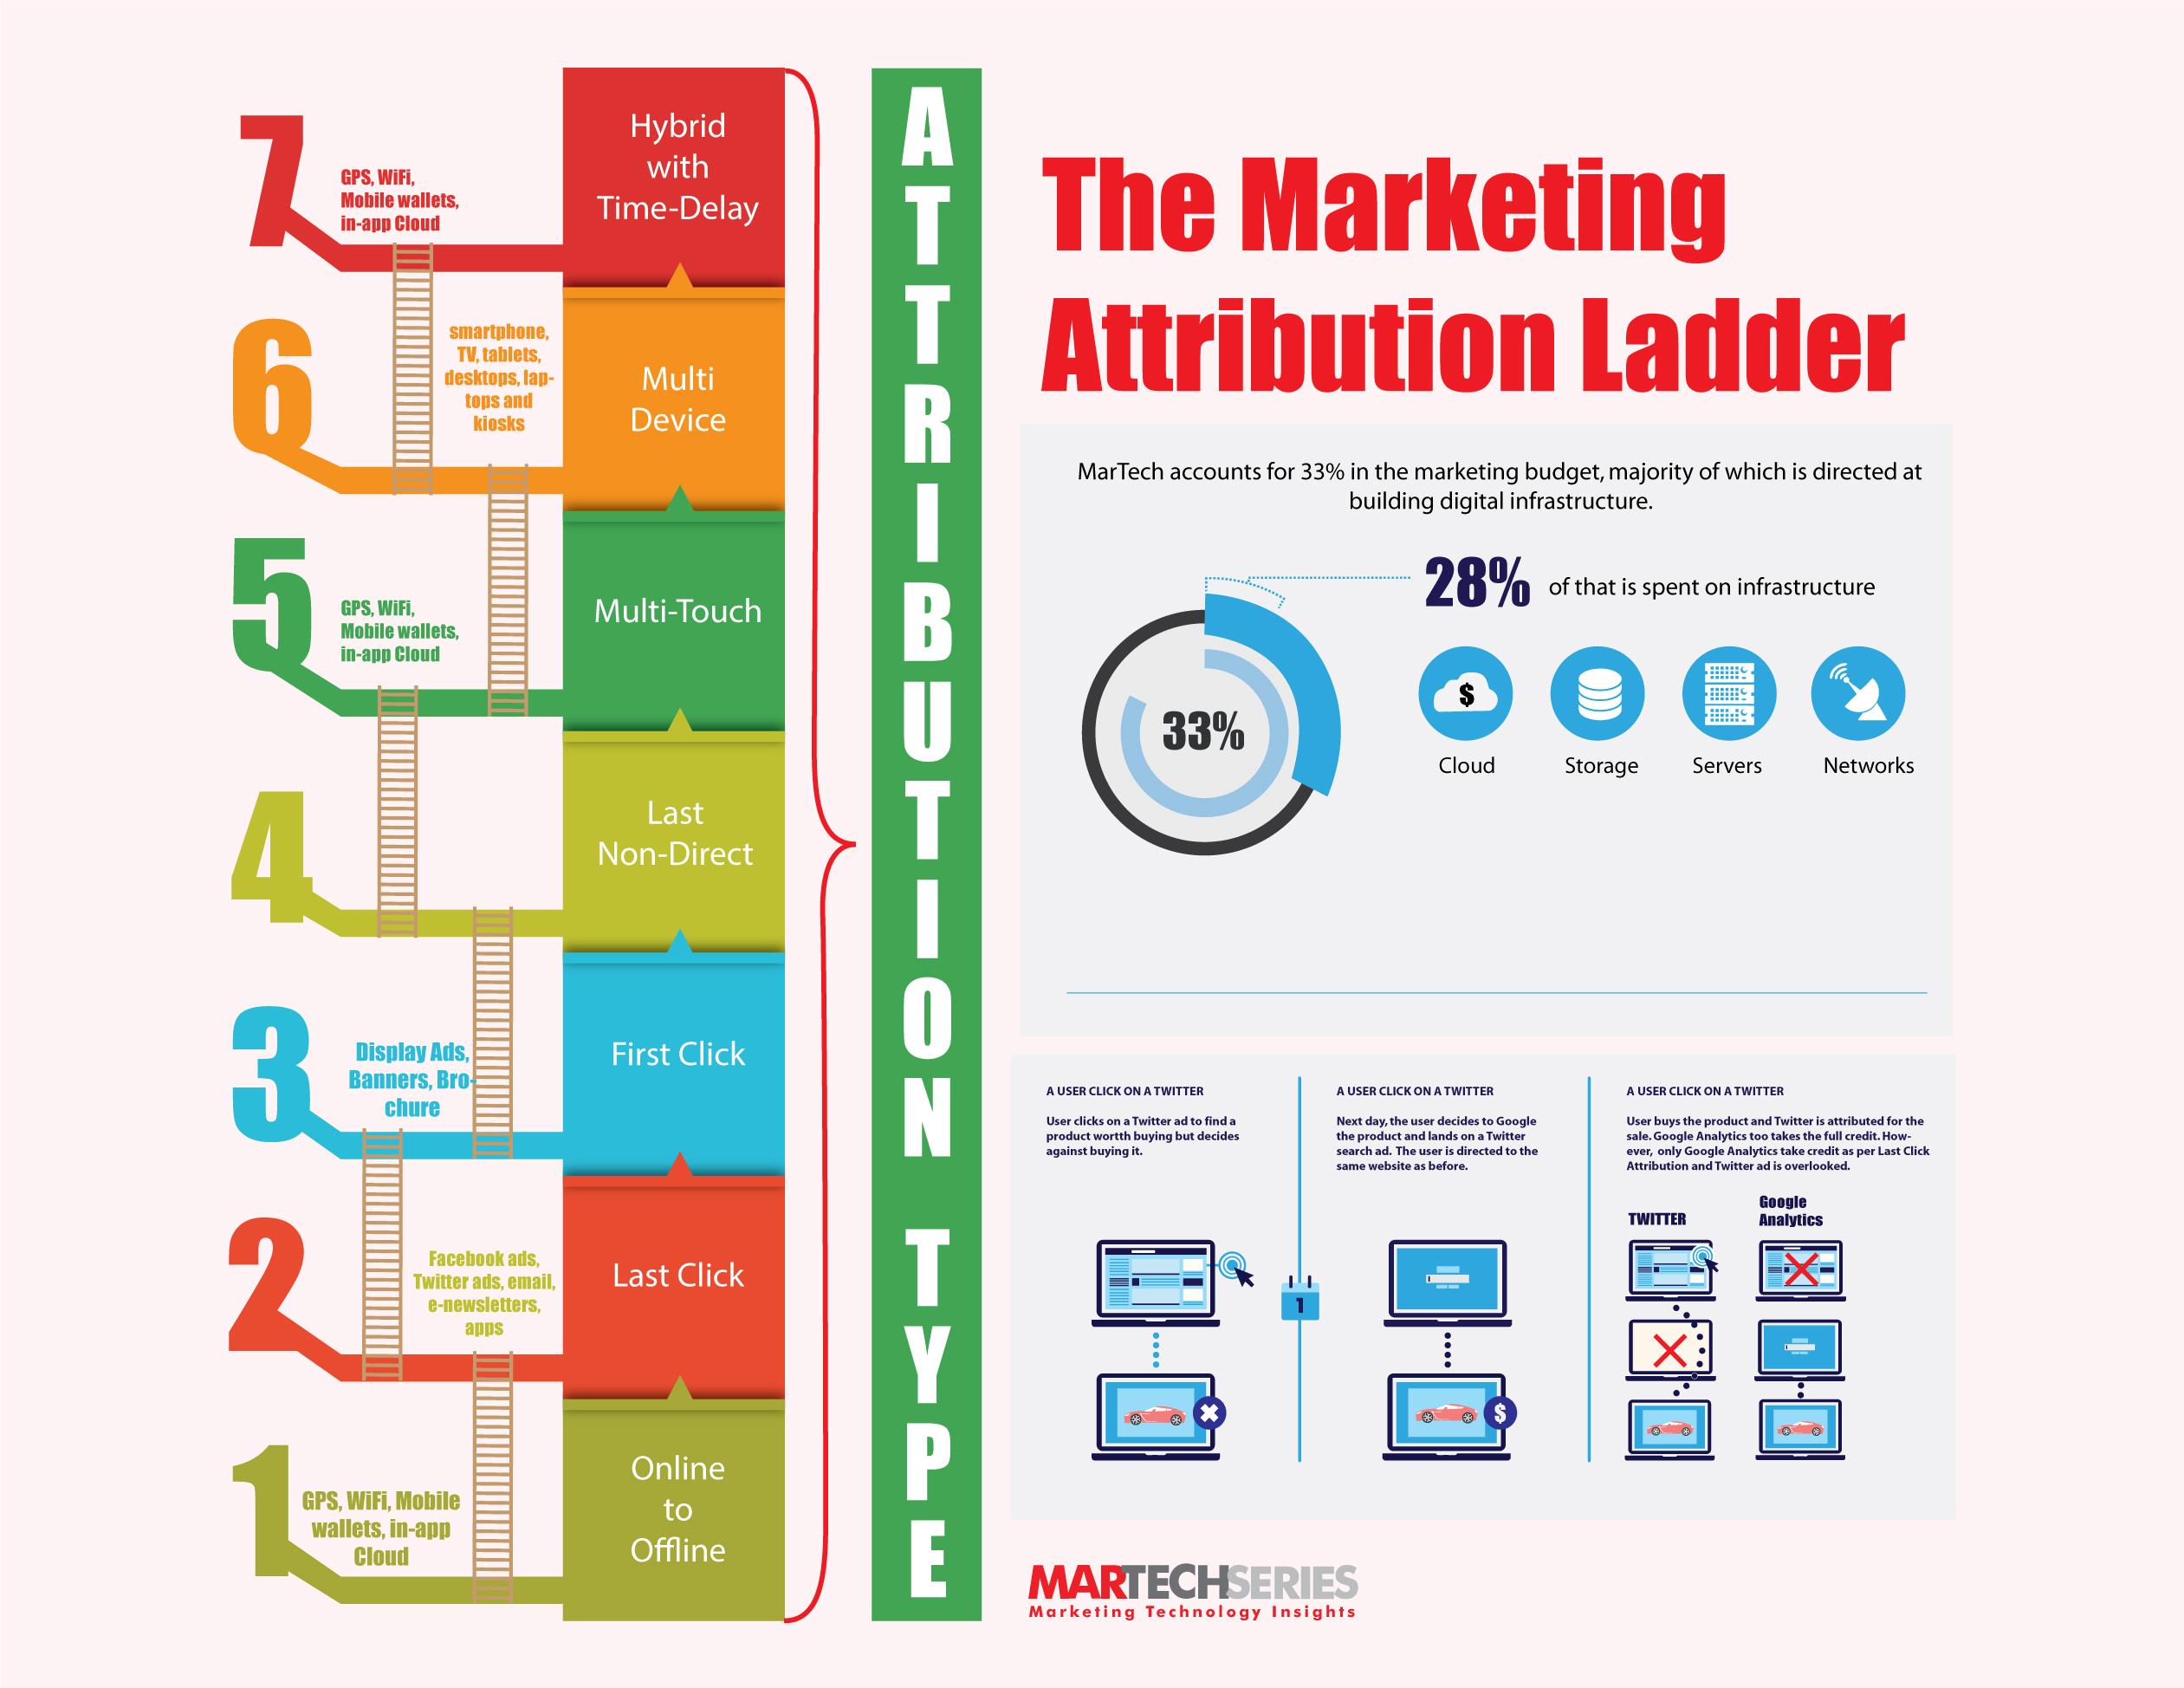 The Marketing Attribution Ladder